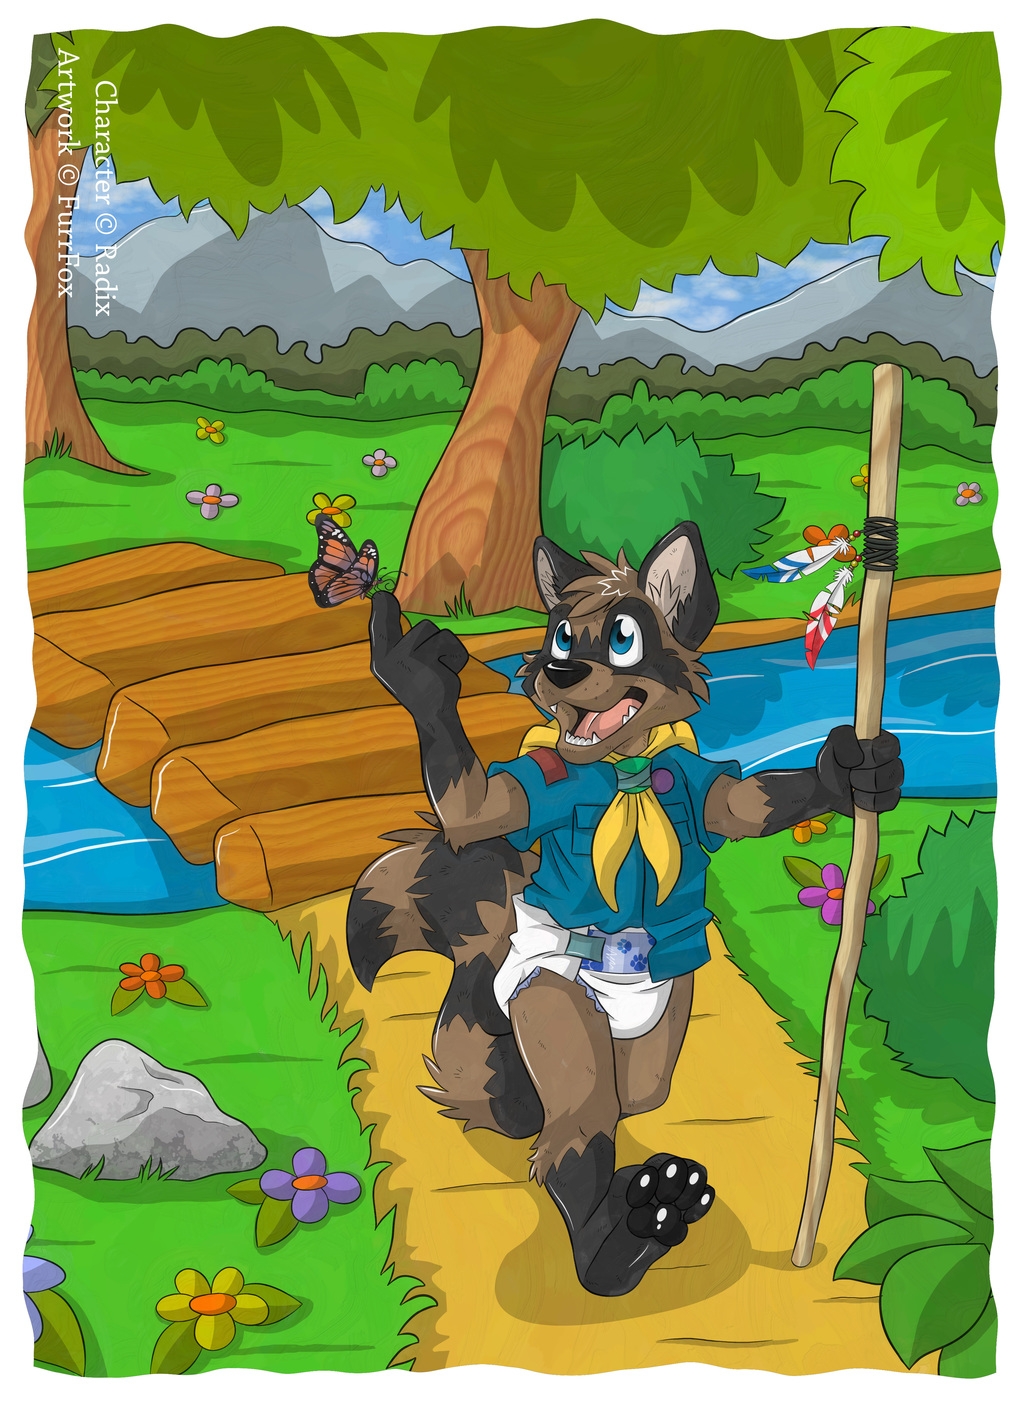 FurrFox Commission - Hiking